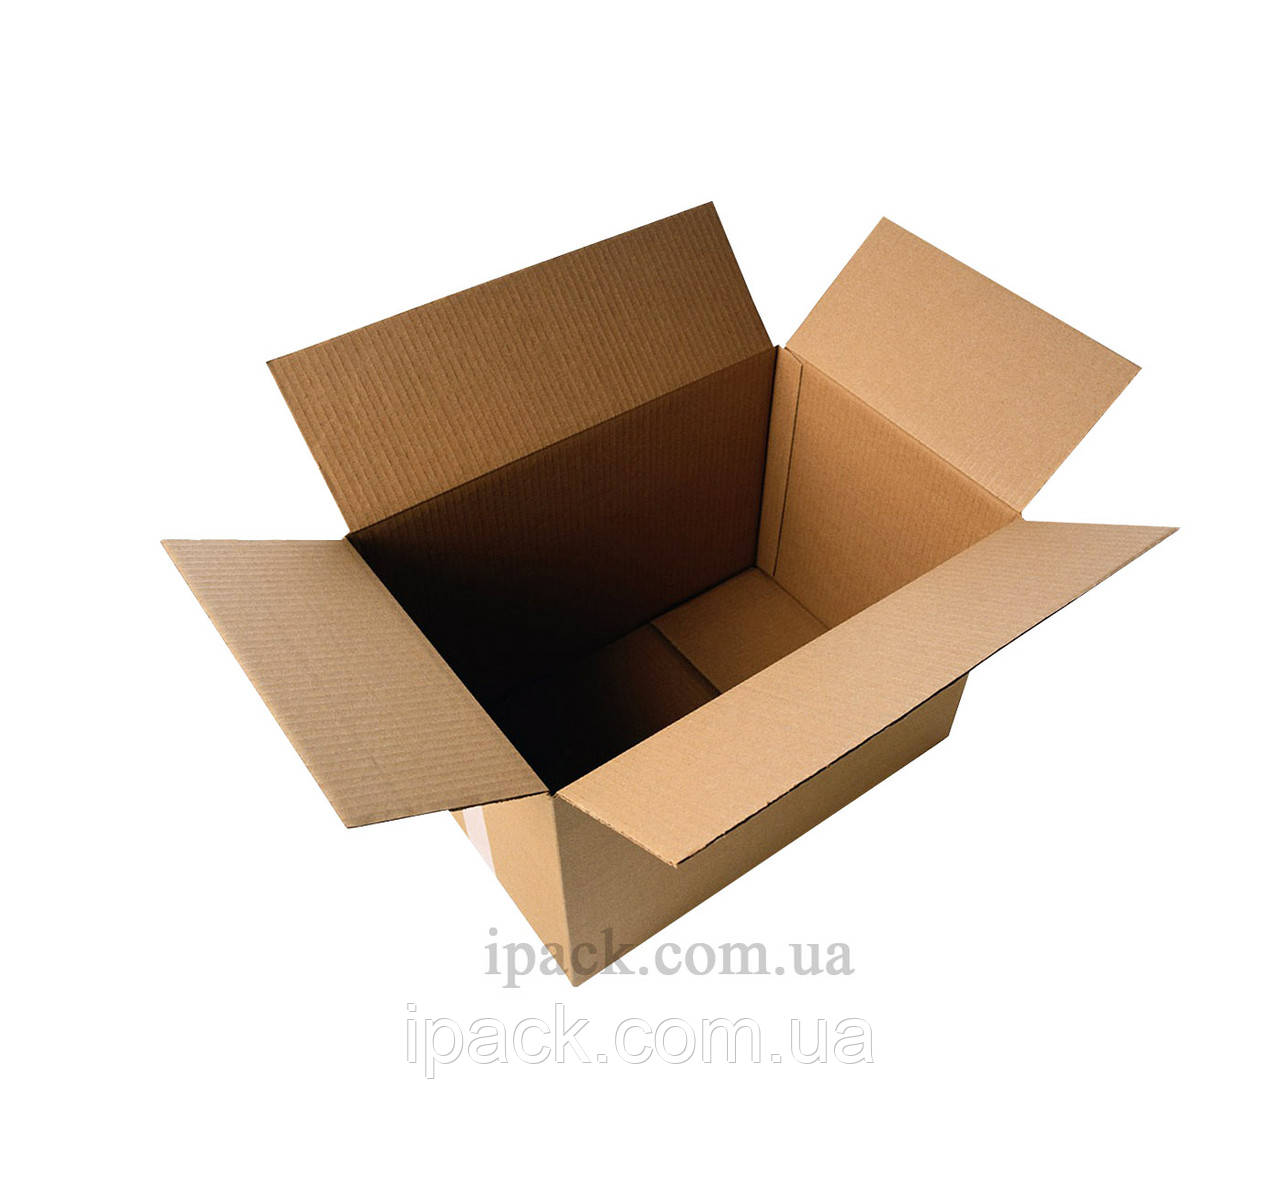 Гофроящик 450*350*320 мм, бурый, четырехклапанный картонный короб